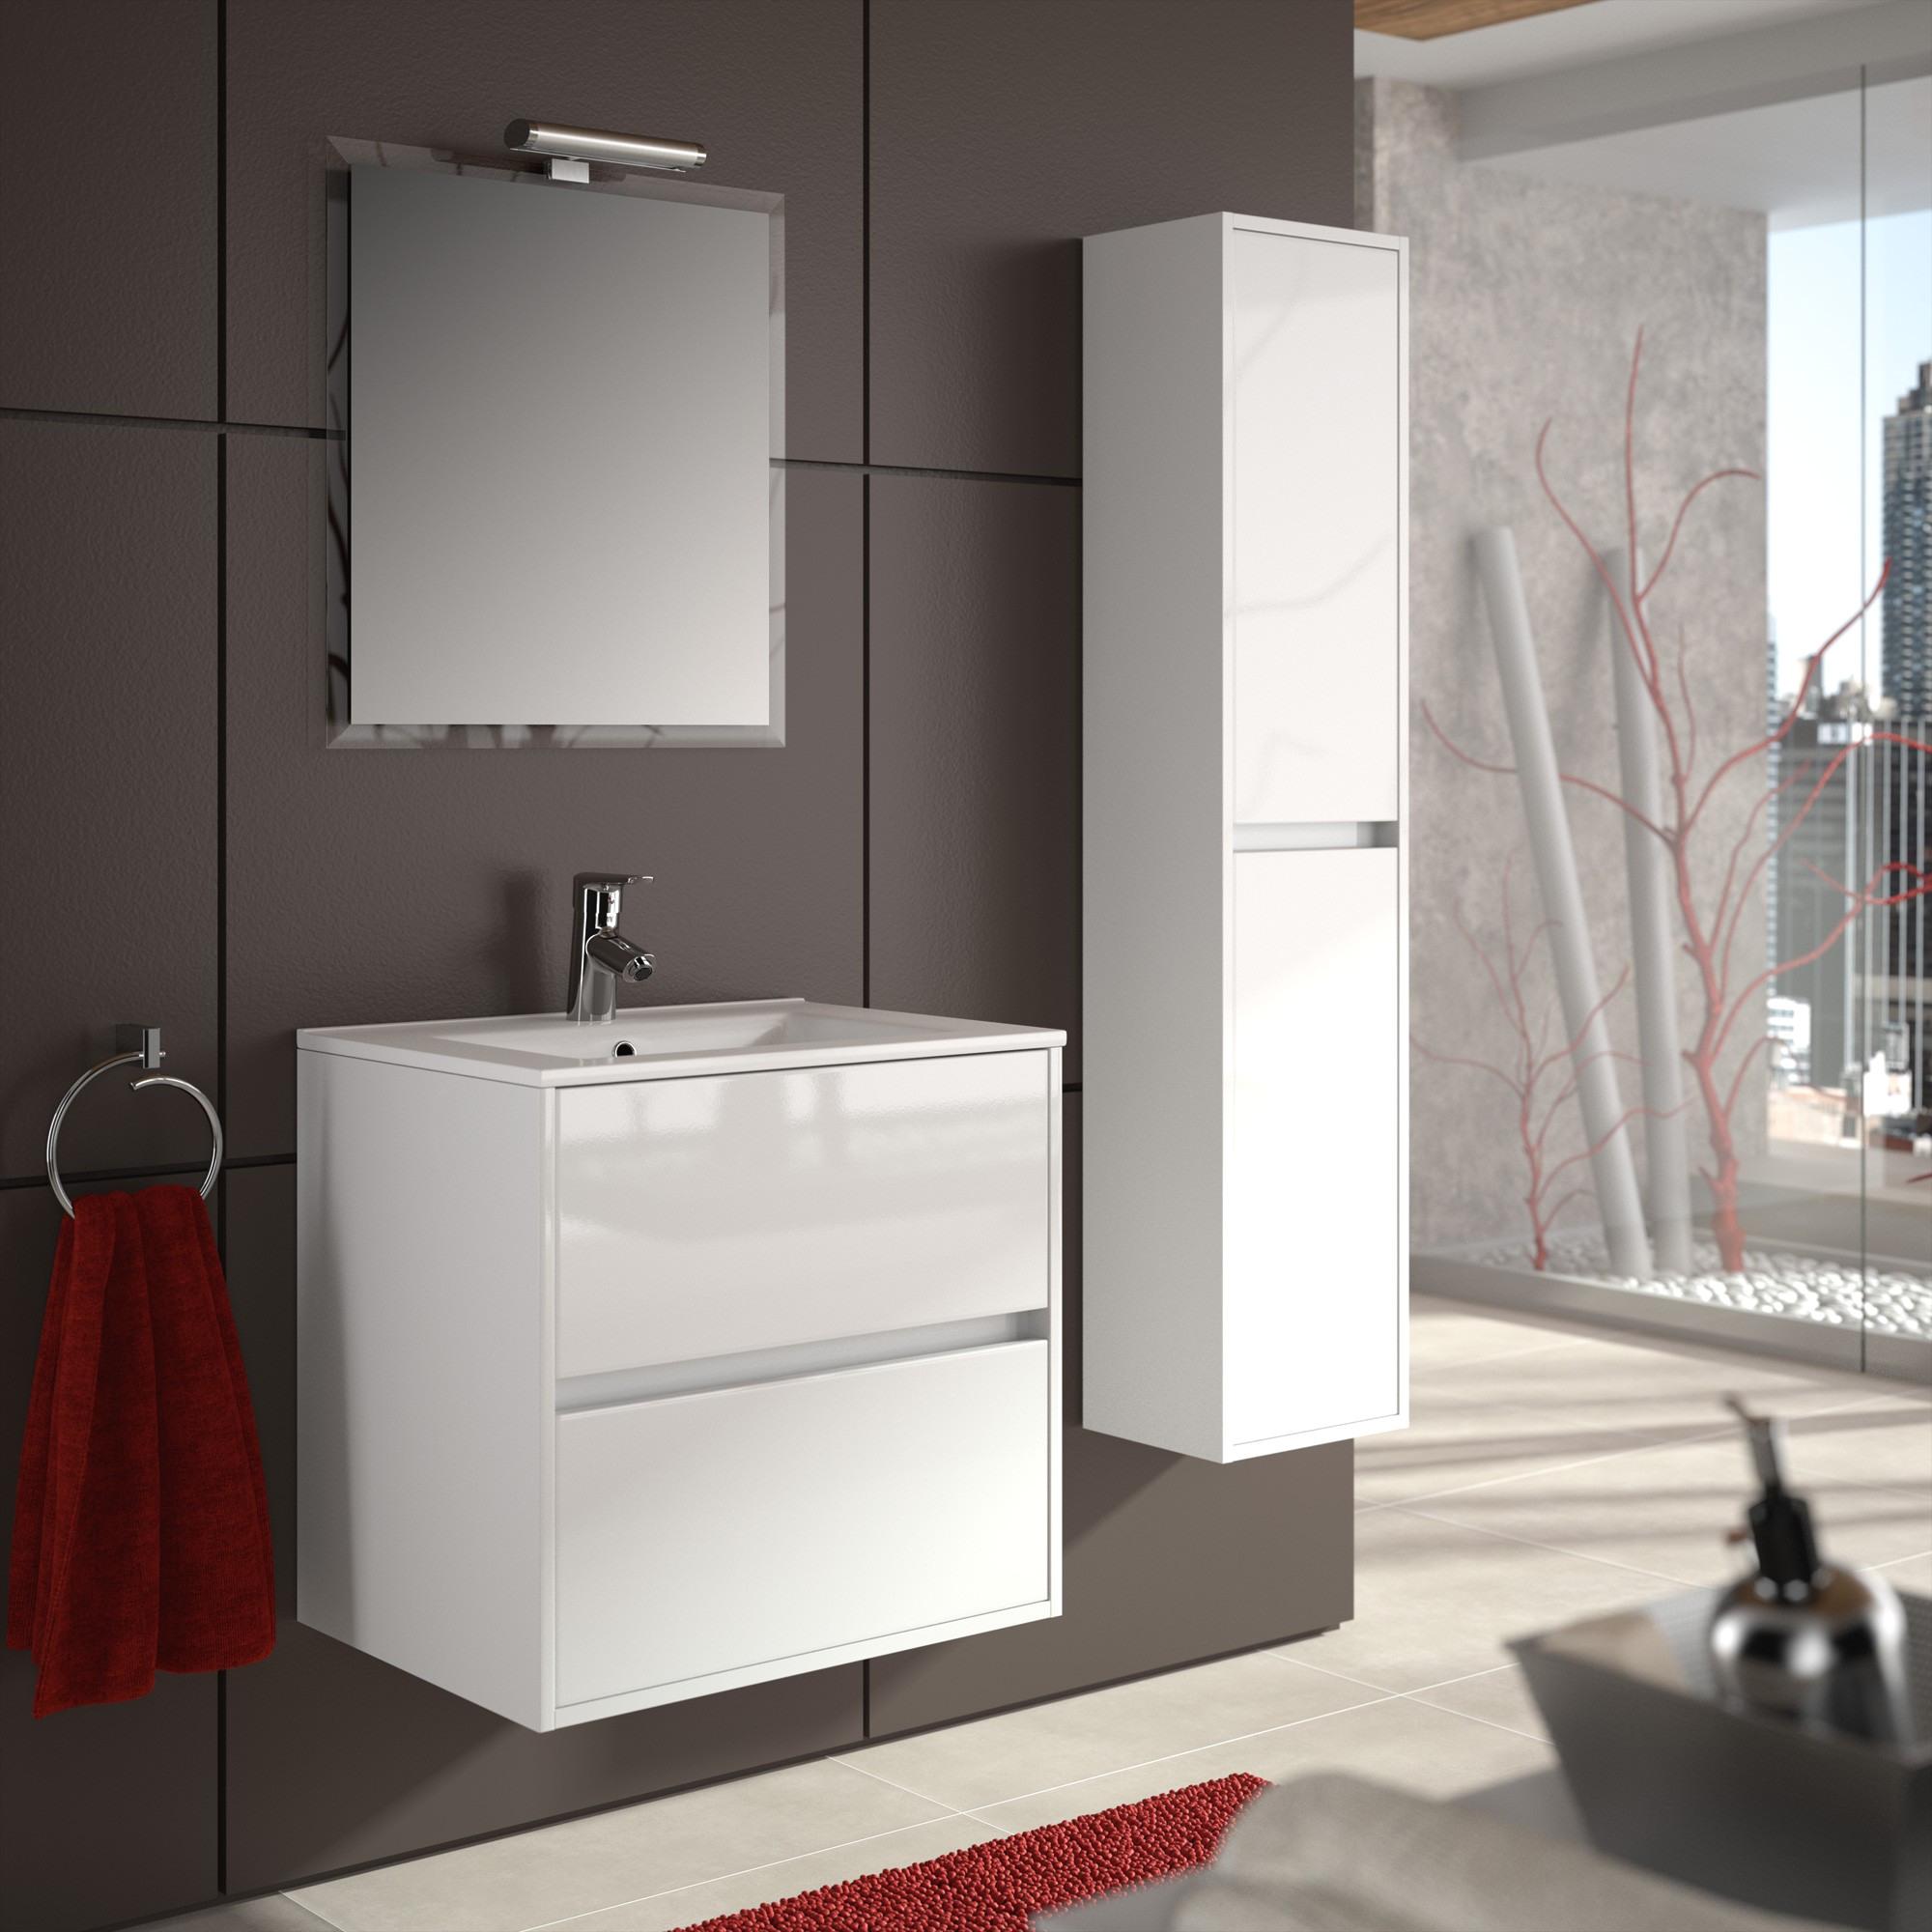 Armoire De toilette Miroir Castorama Beau Galerie Meuble Vasque Wc Beau Best Meuble Salle De Bain Castorama Colonne